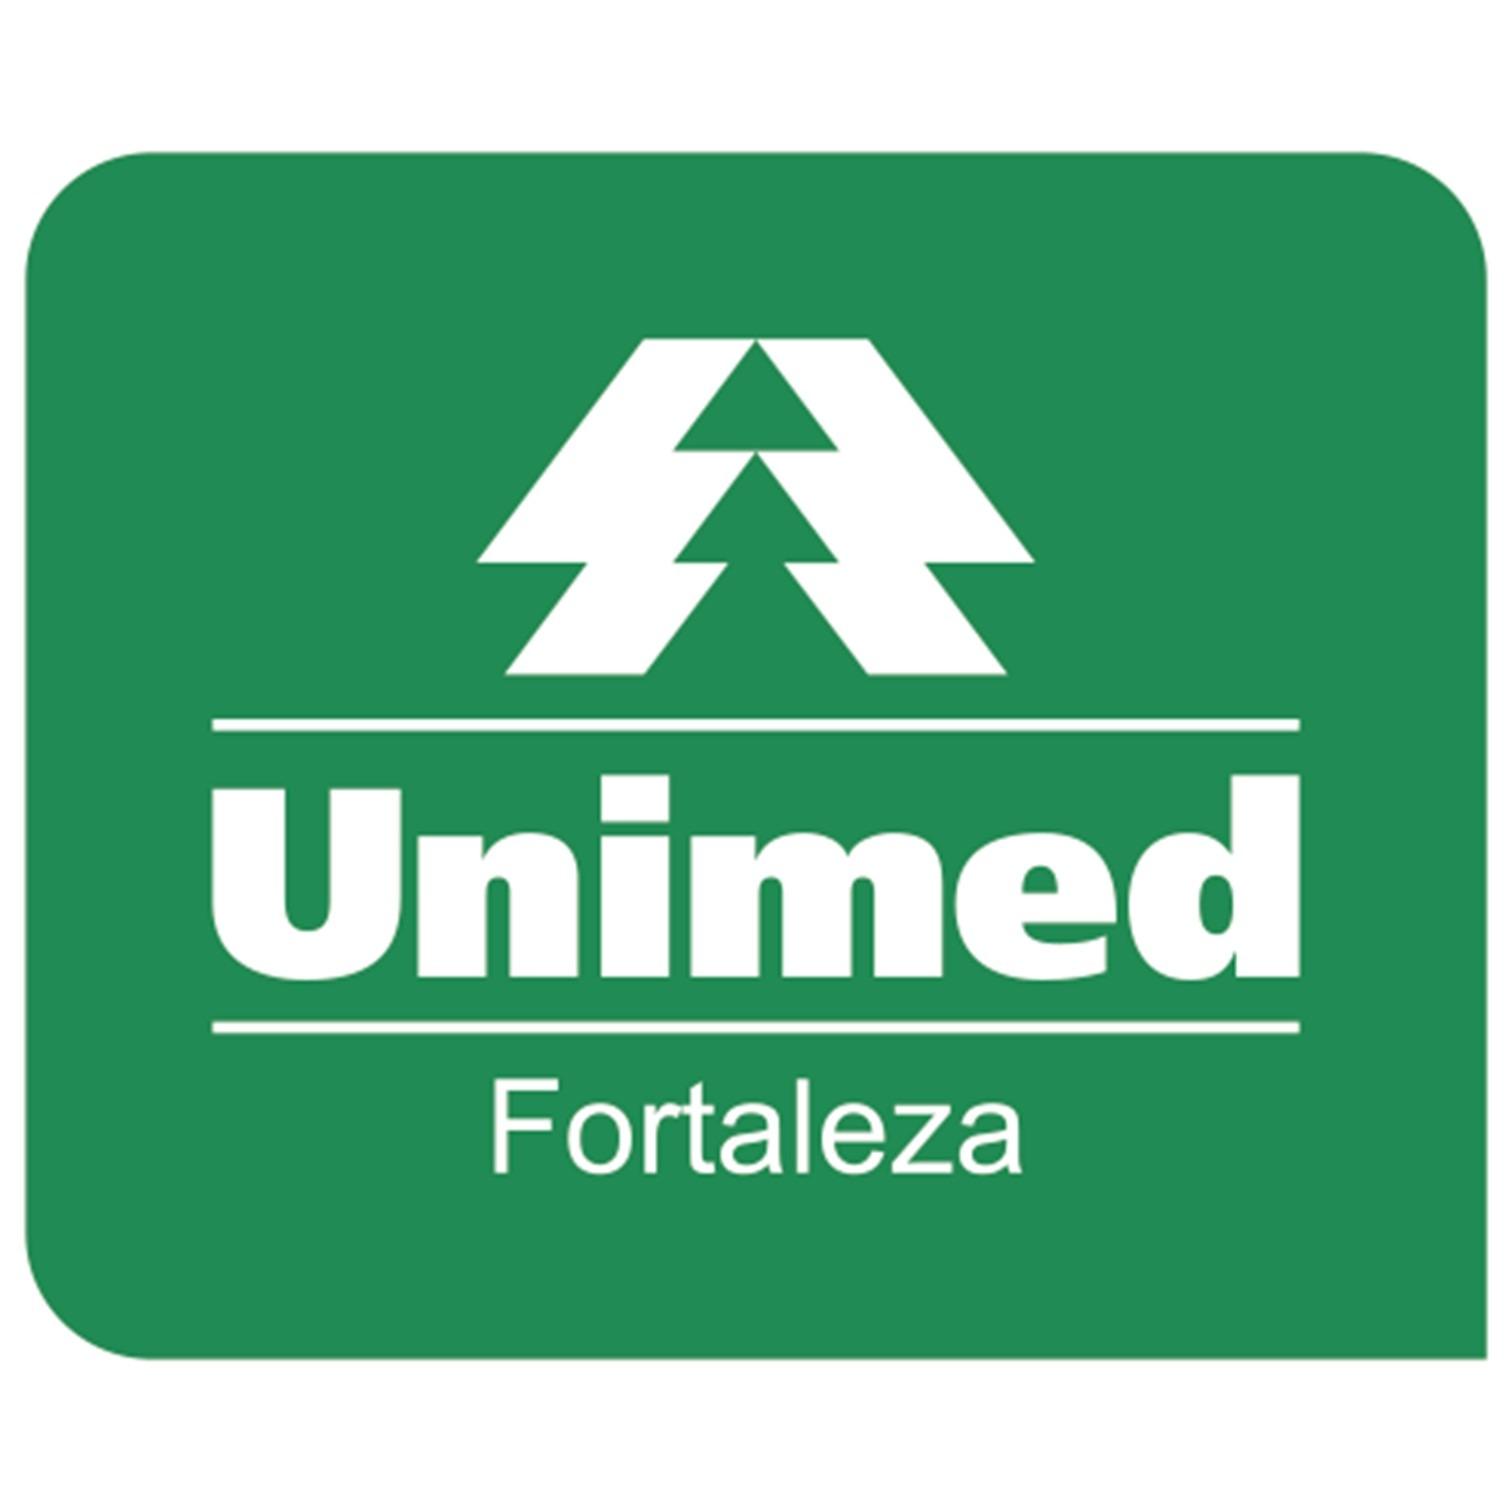 Unimed Fortaleza